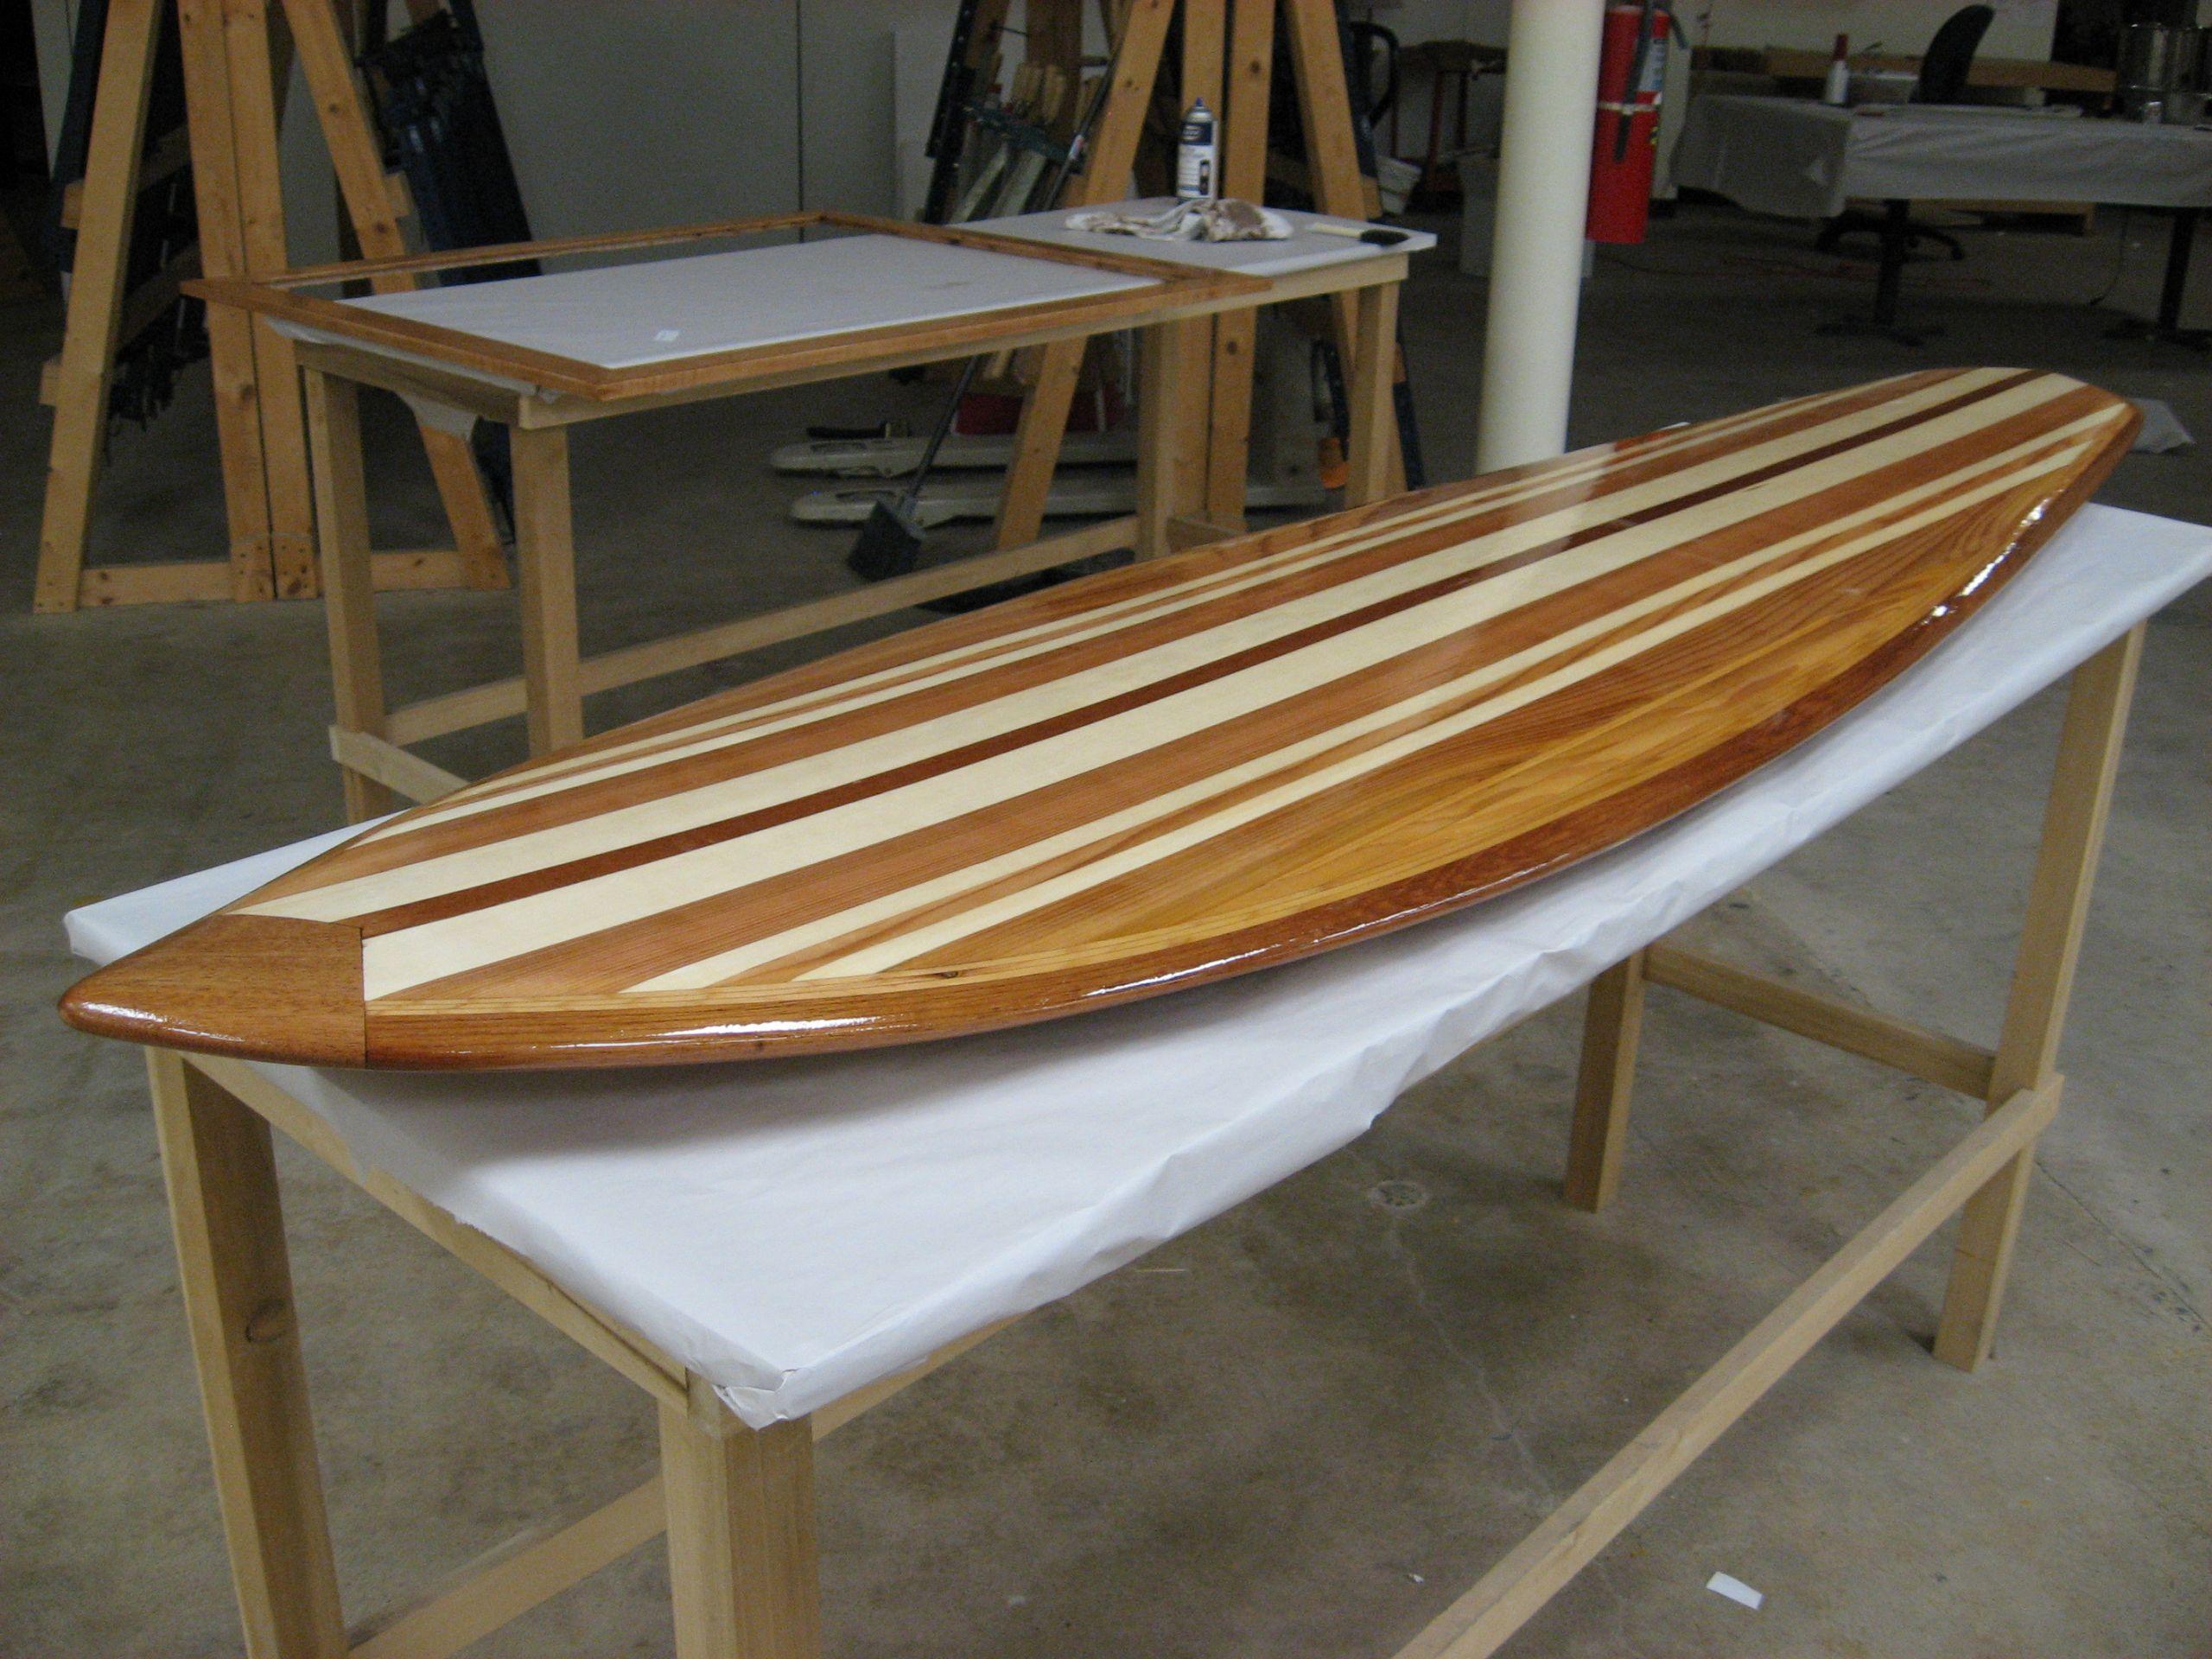 DIY Wood Surfboard  DIY Wooden Surfboard Plans PDF Download wood playhouse kit